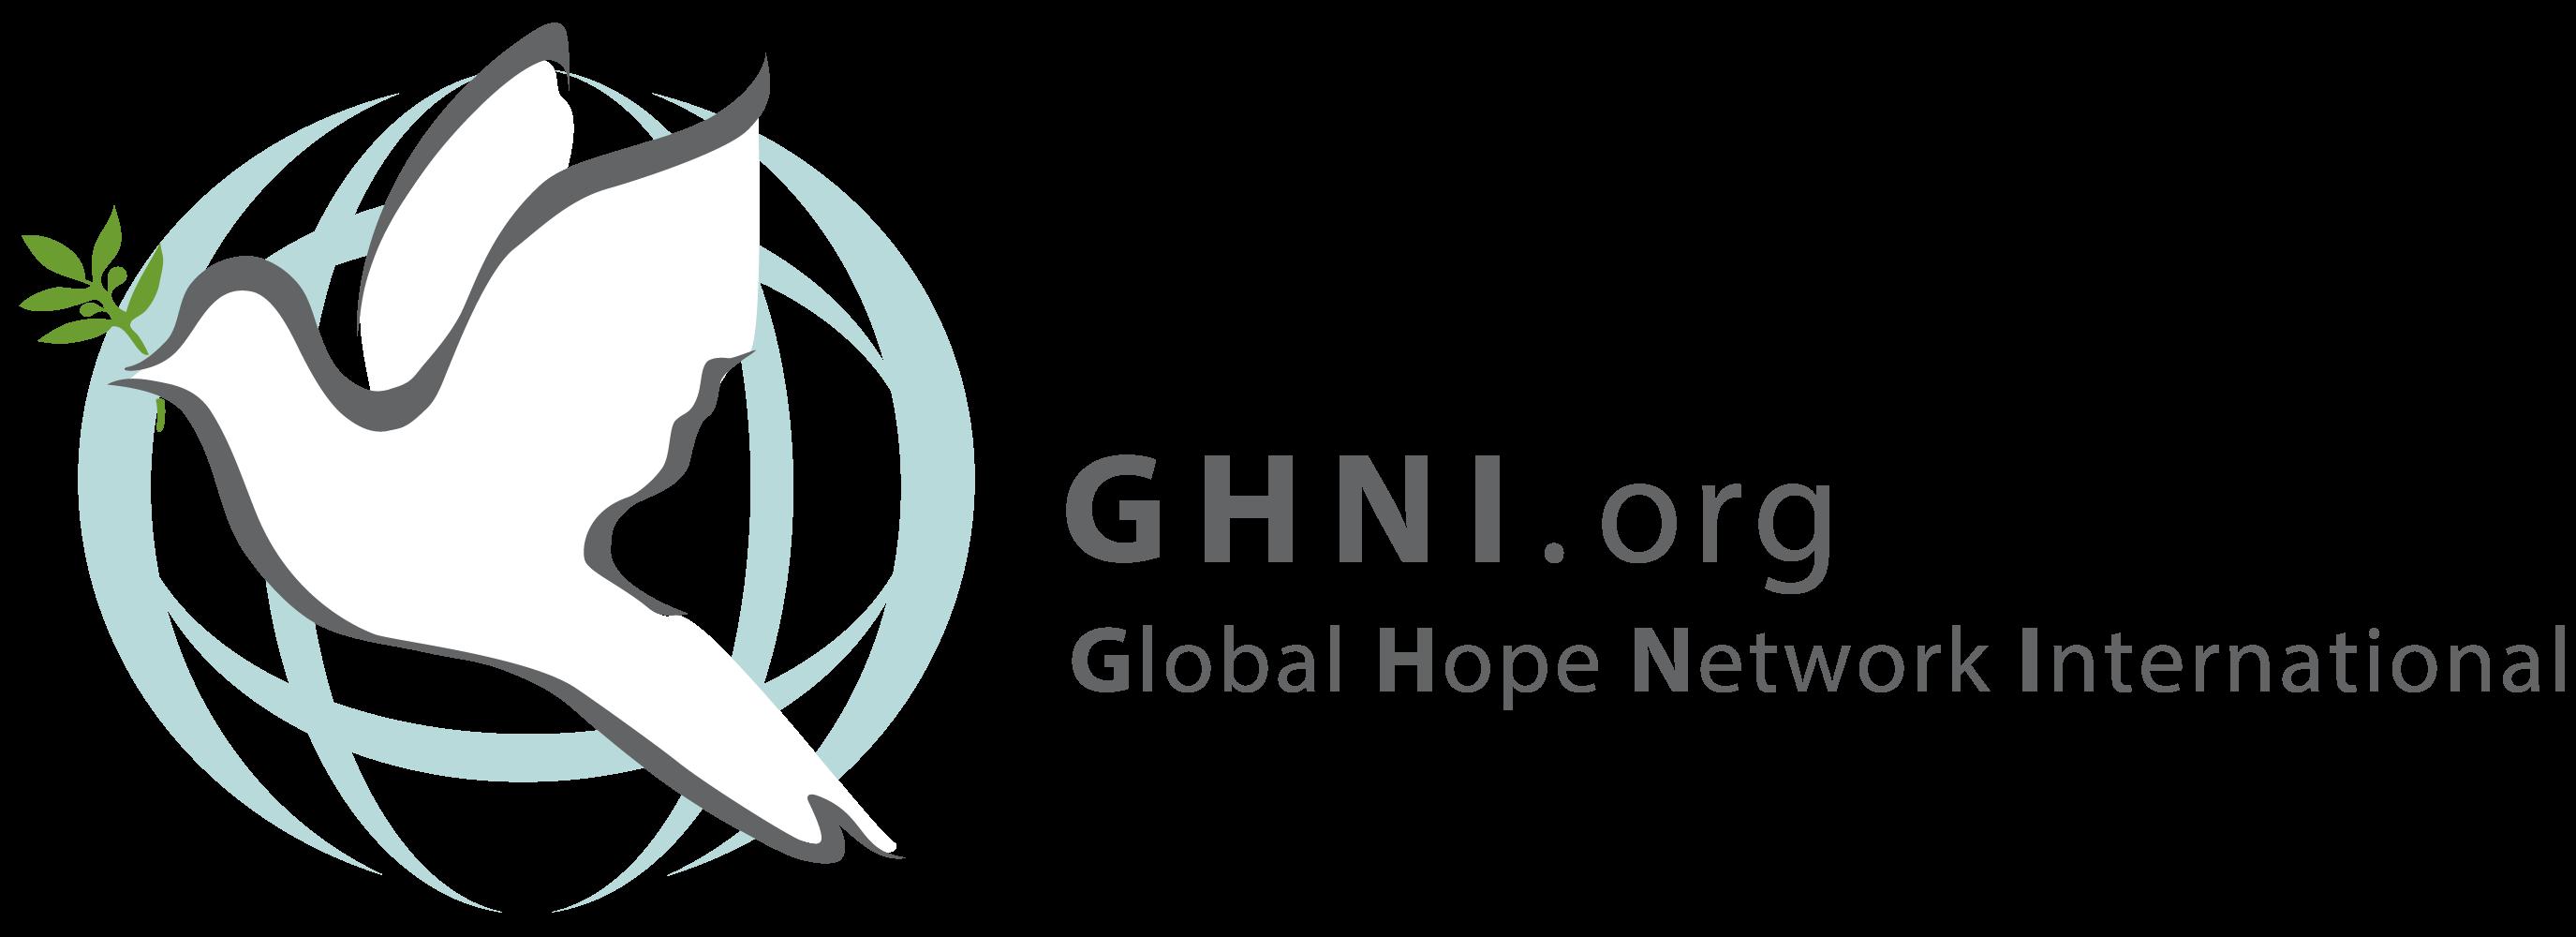 Global Hope Network International logo